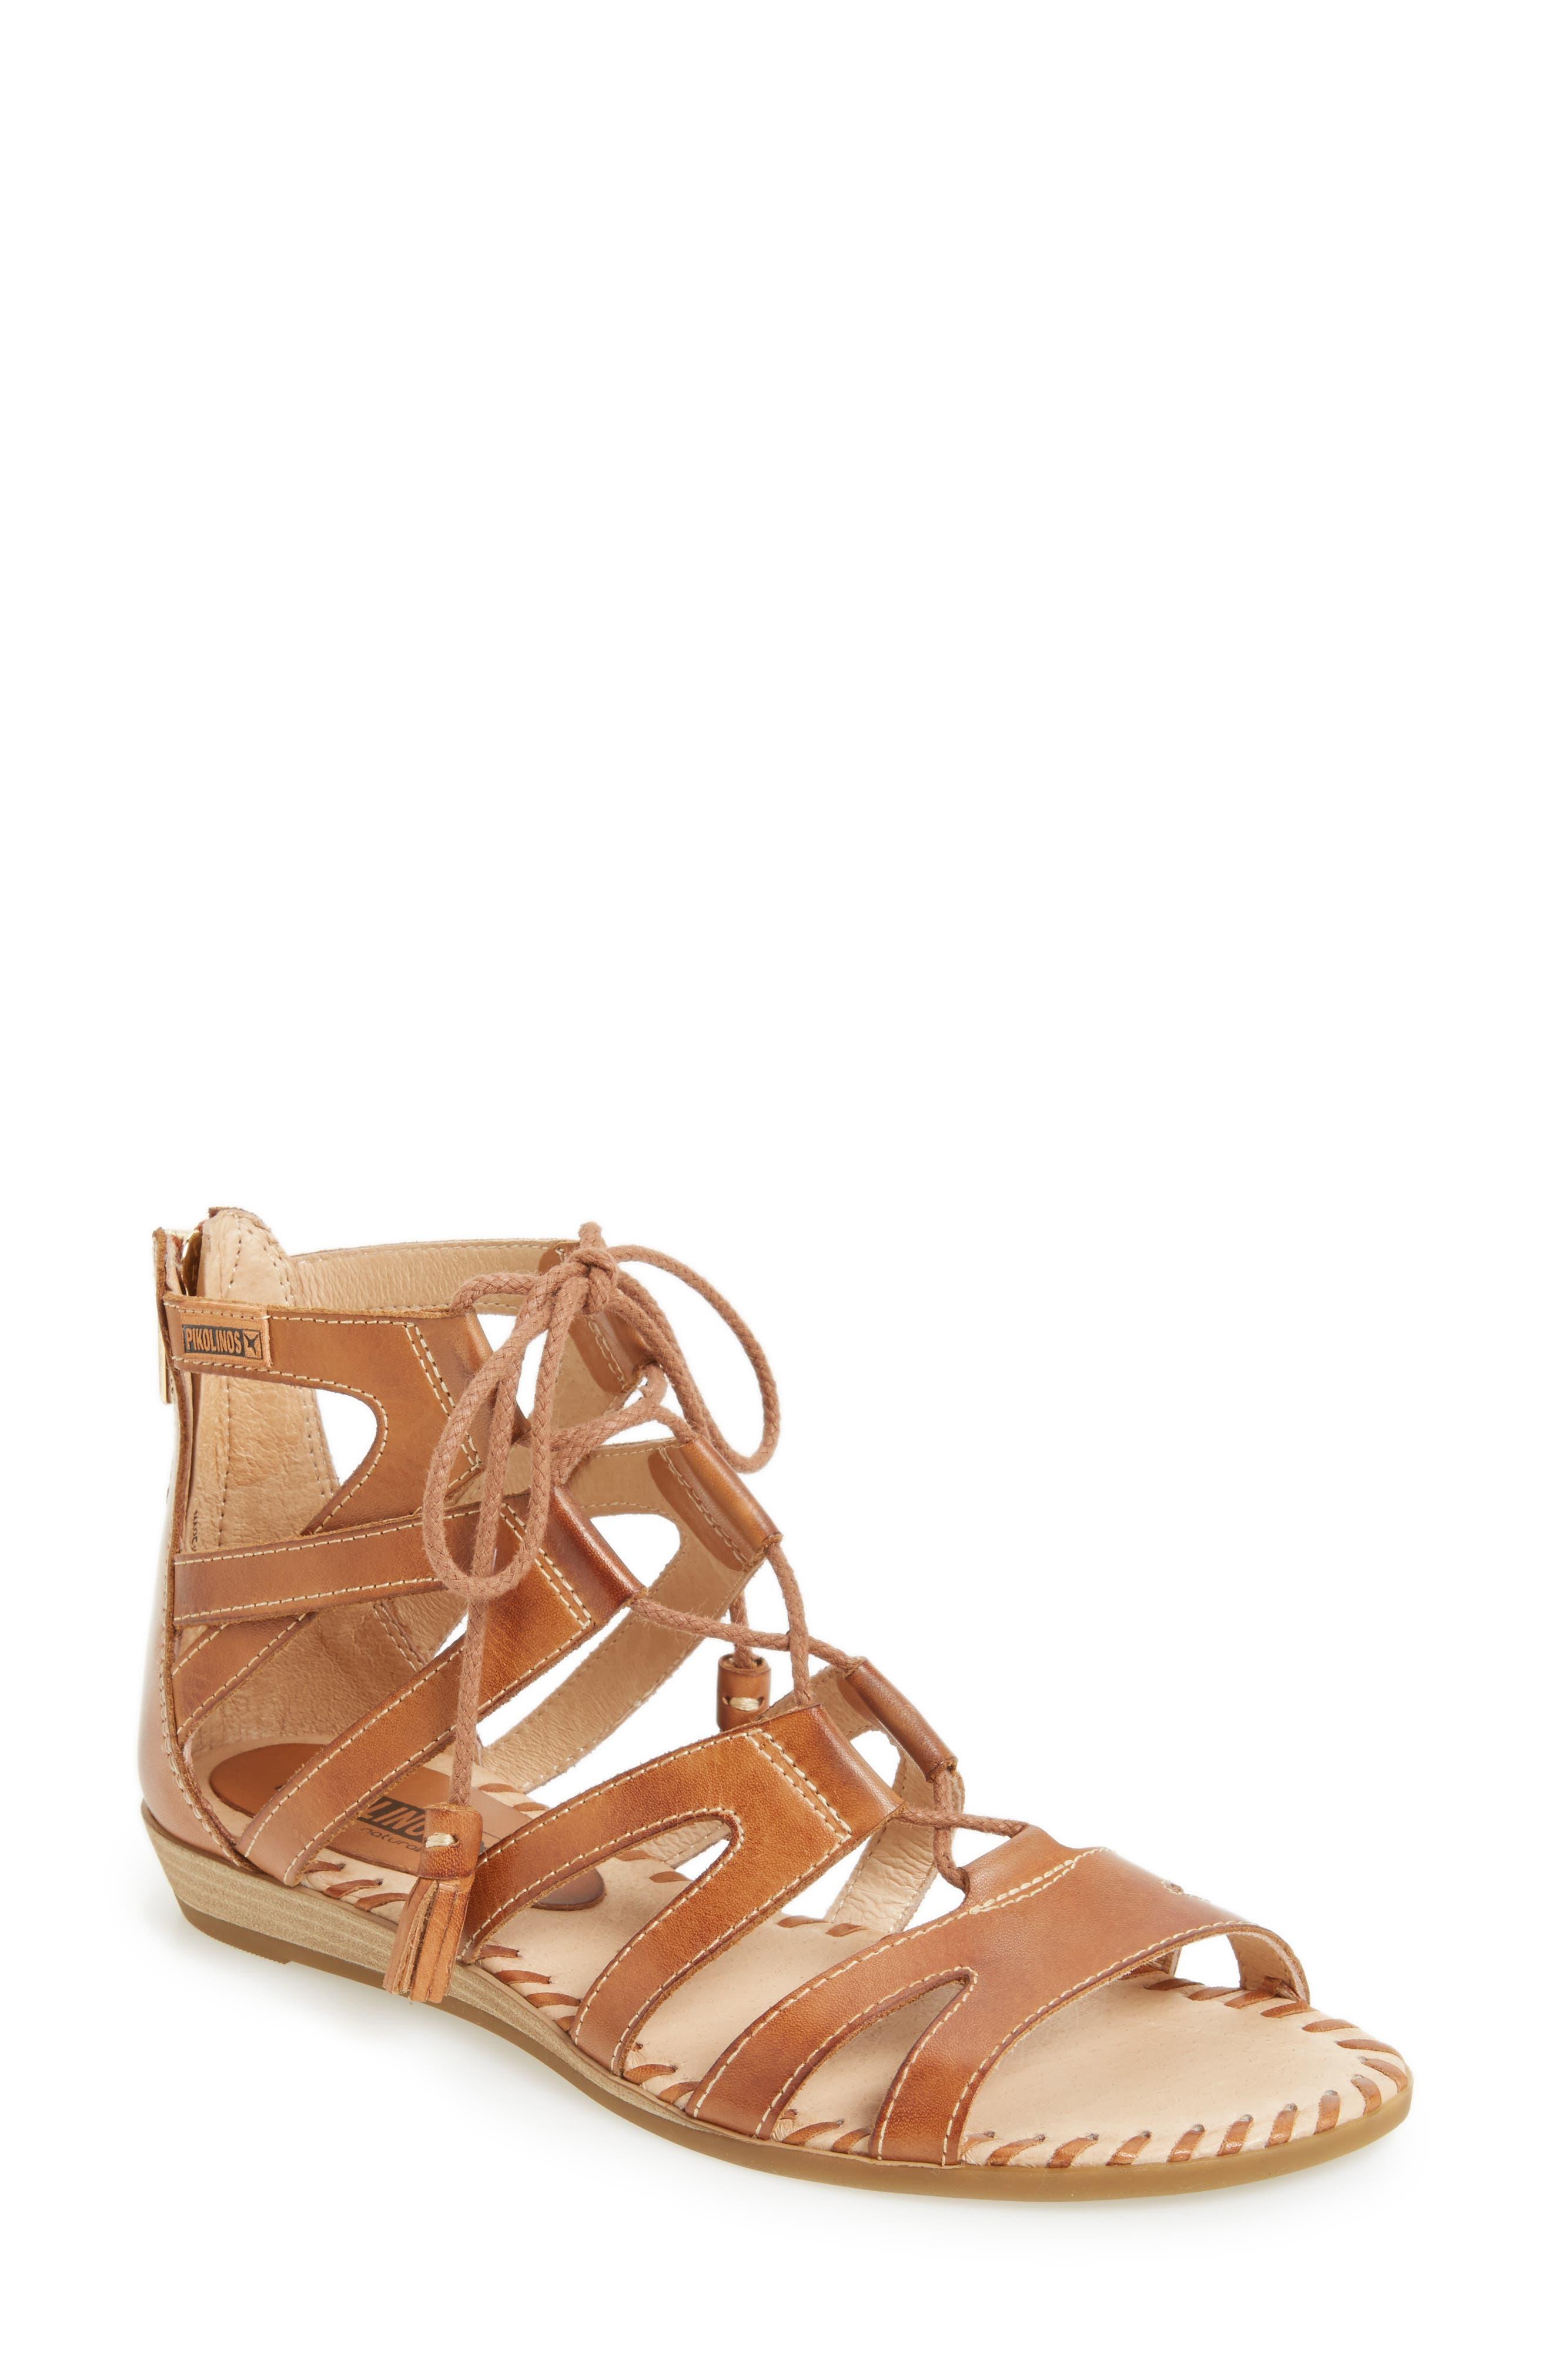 'Alcudia' Lace-Up Sandal,                         Main,                         color,